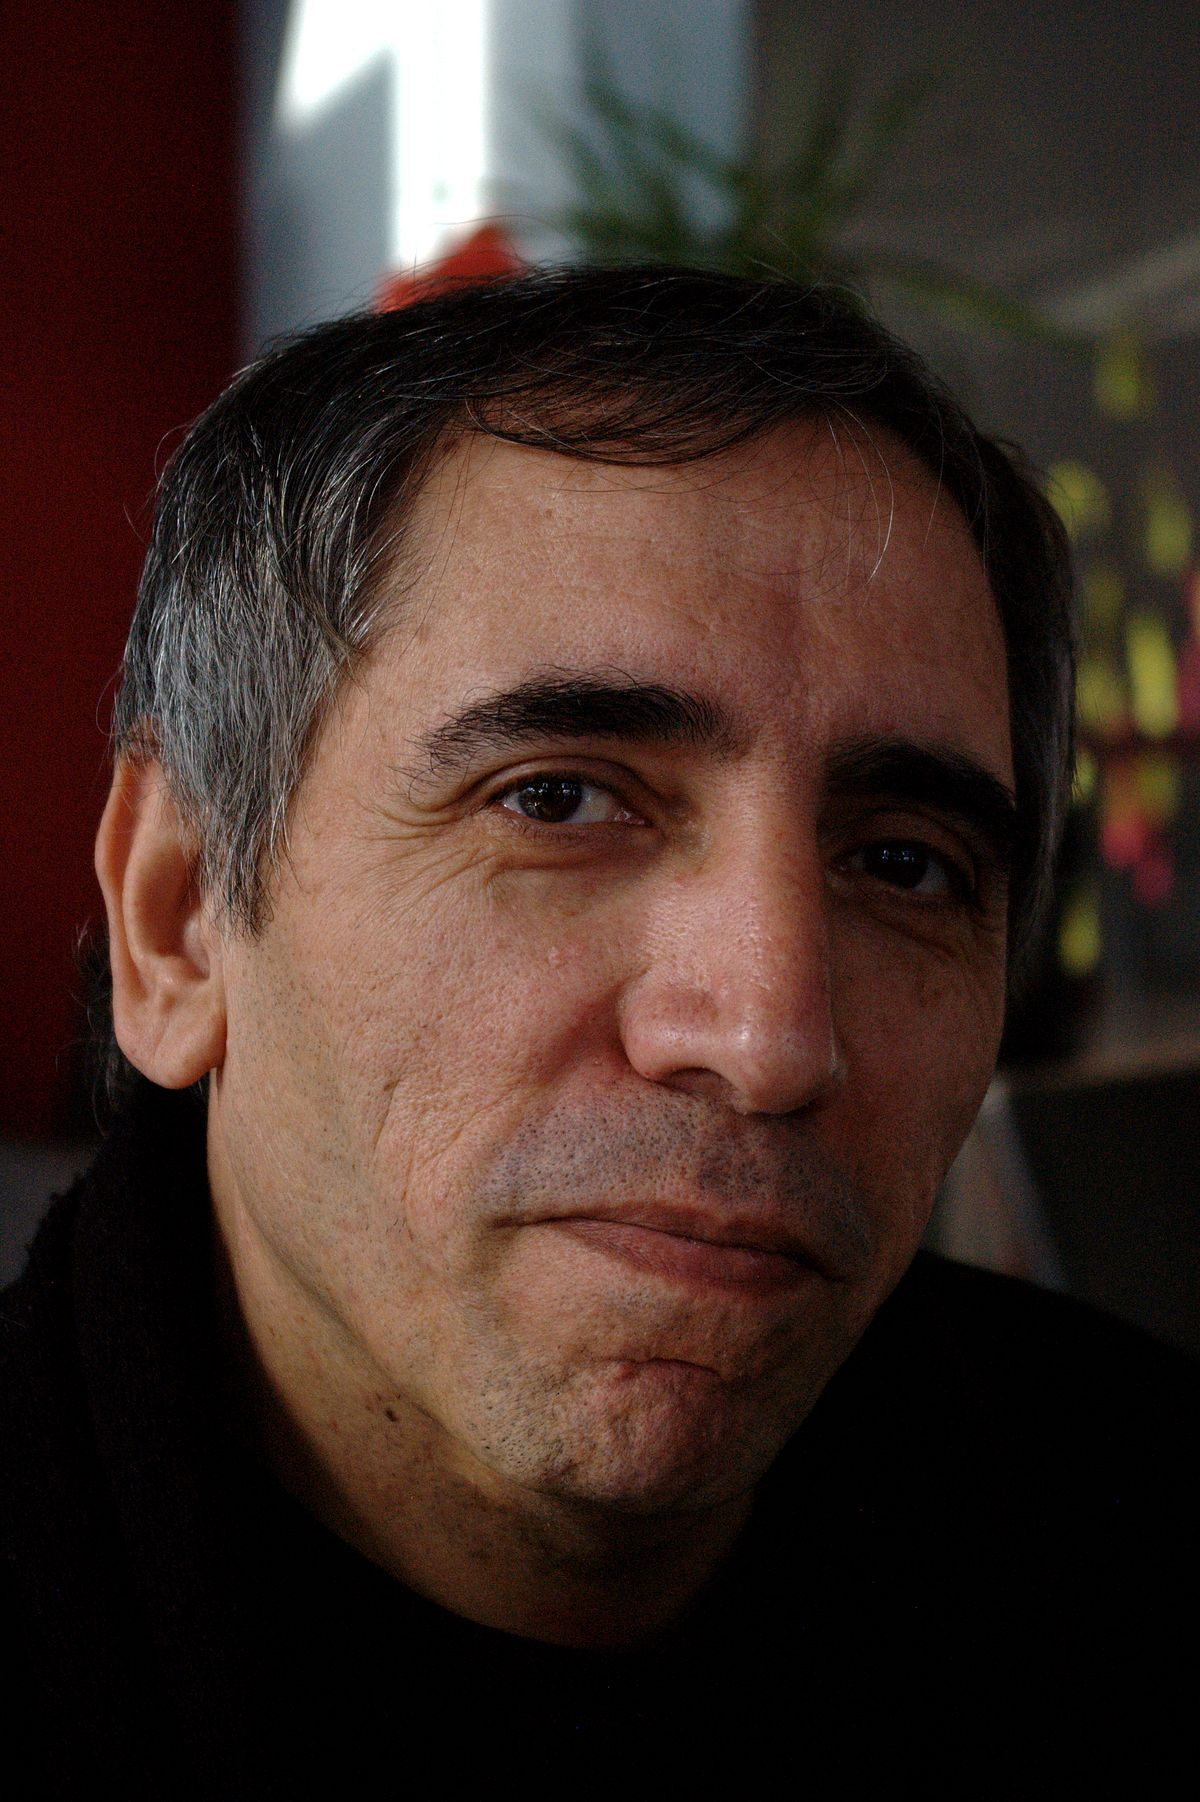 maysam makhmalbaf biography definition